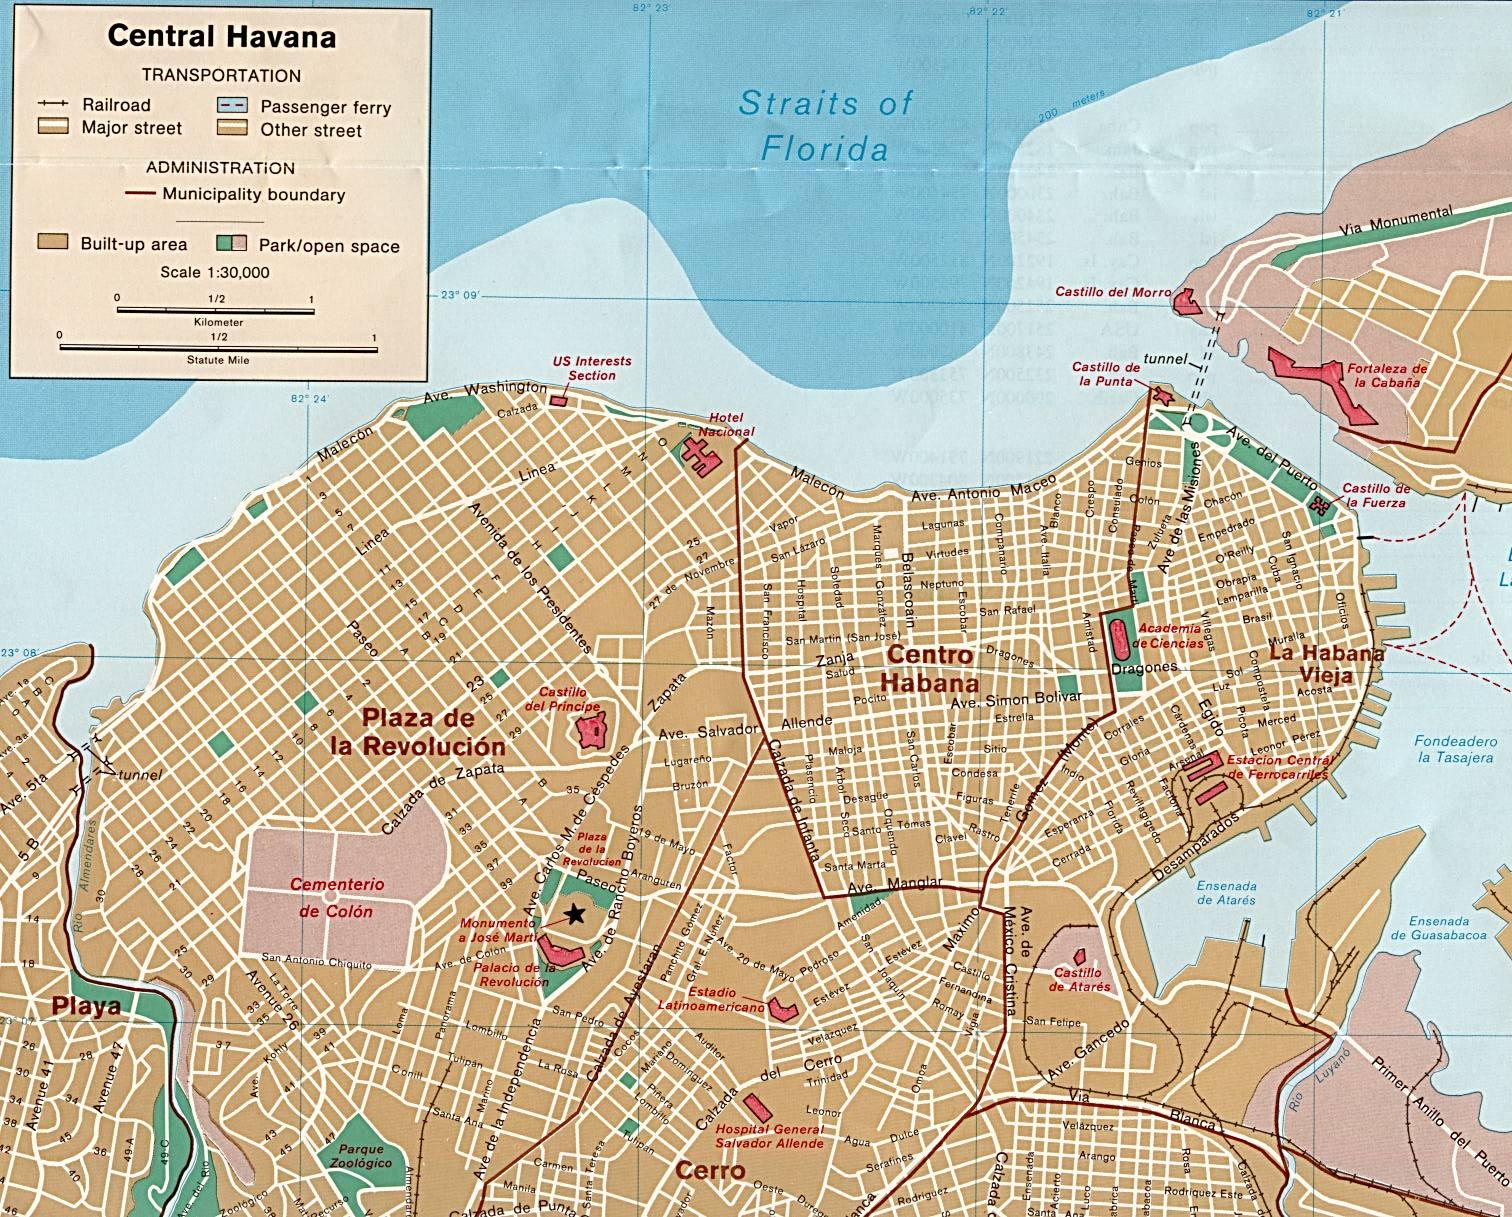 mapa de havana Mapas de Havana   Cuba   MapasBlog mapa de havana